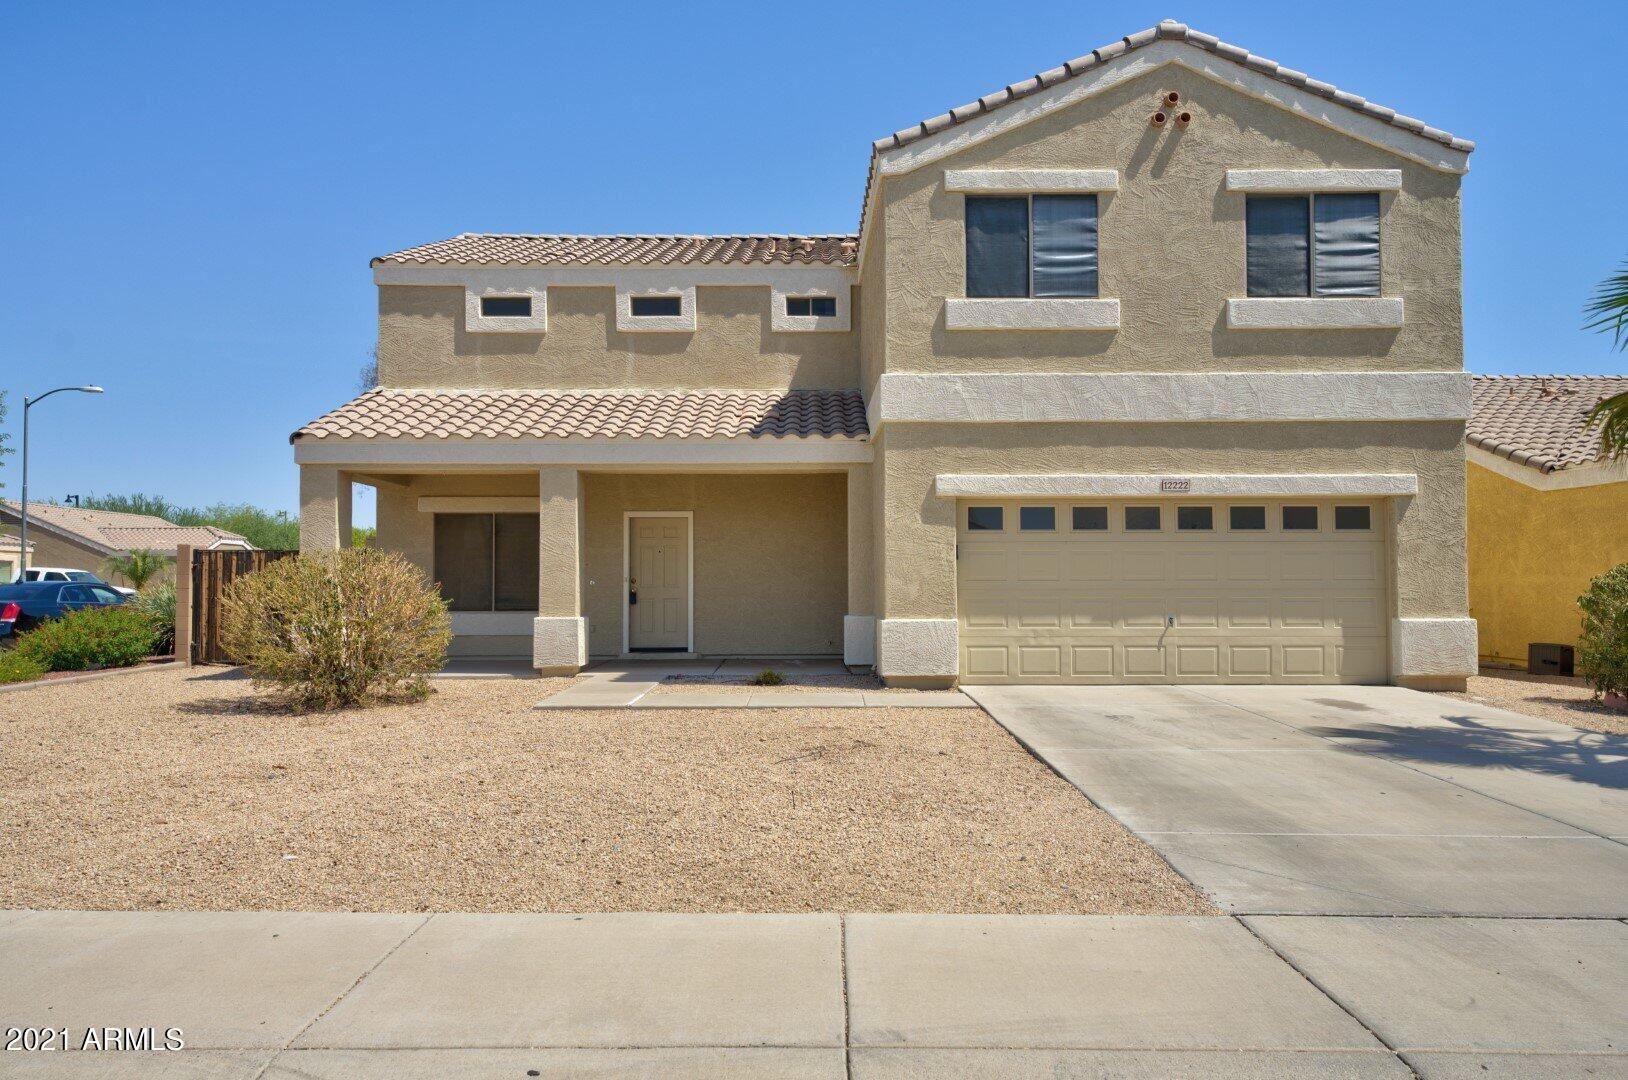 Photo of 12222 W PERSHING Avenue, El Mirage, AZ 85335 (MLS # 6263381)